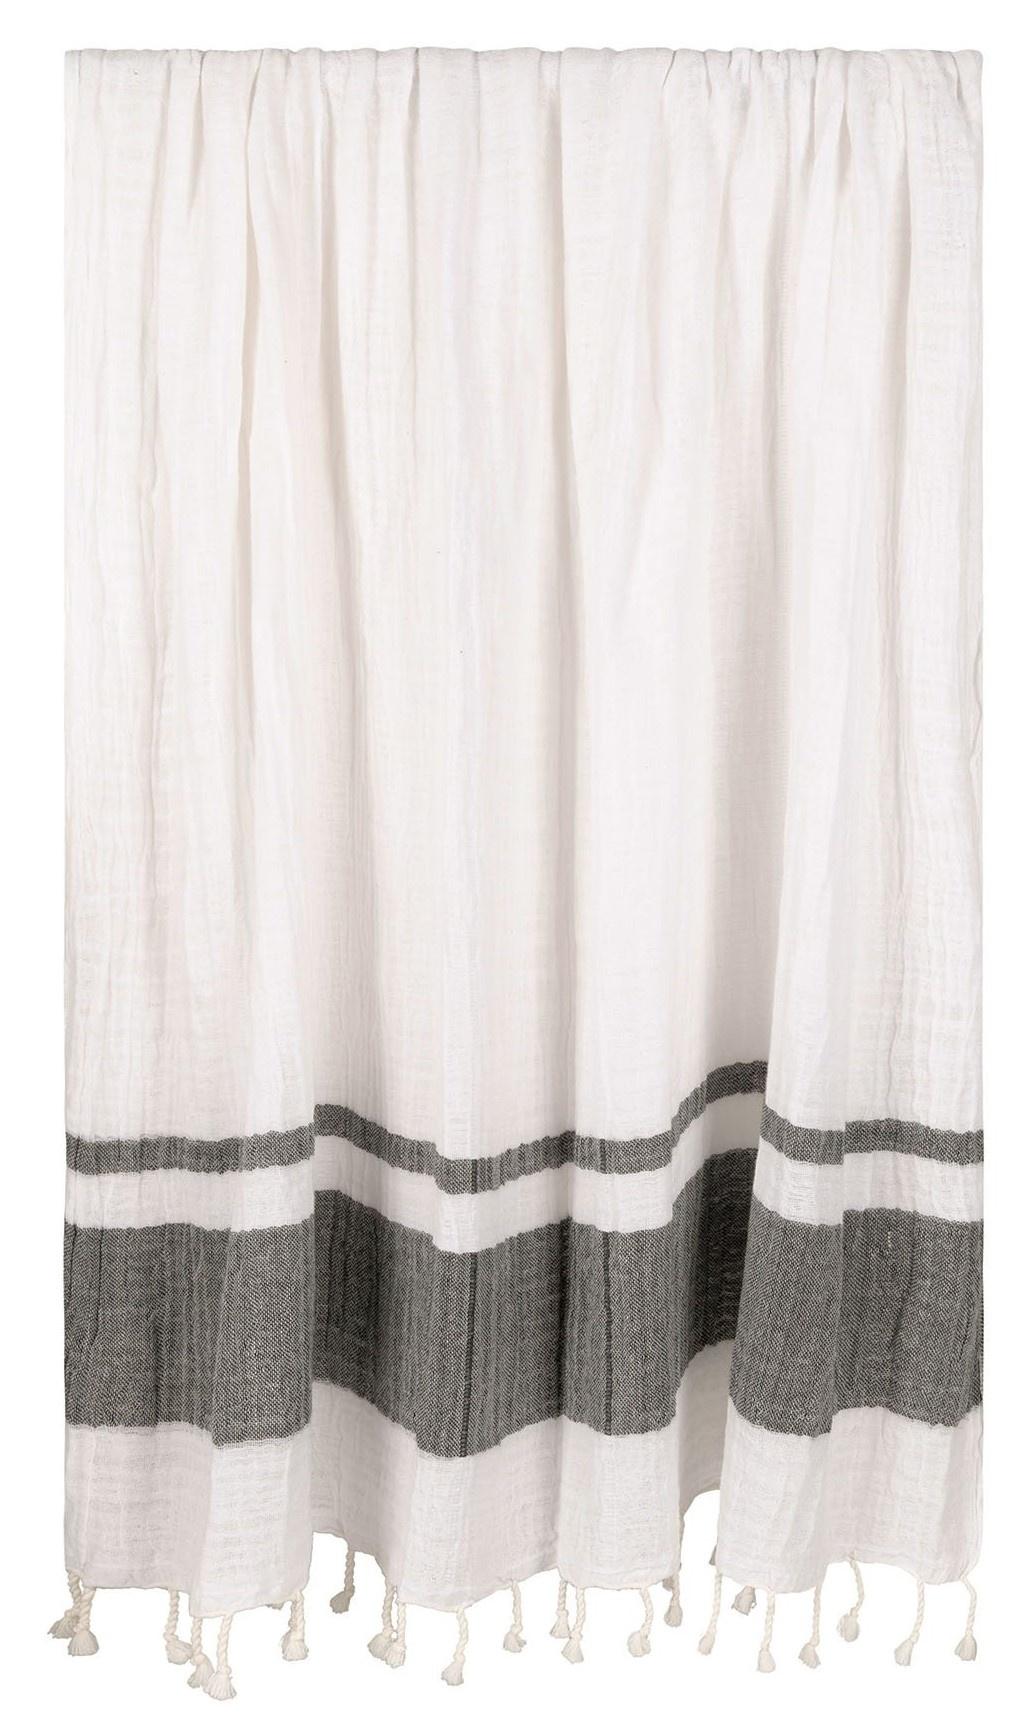 Handdoek hamam towel white-4